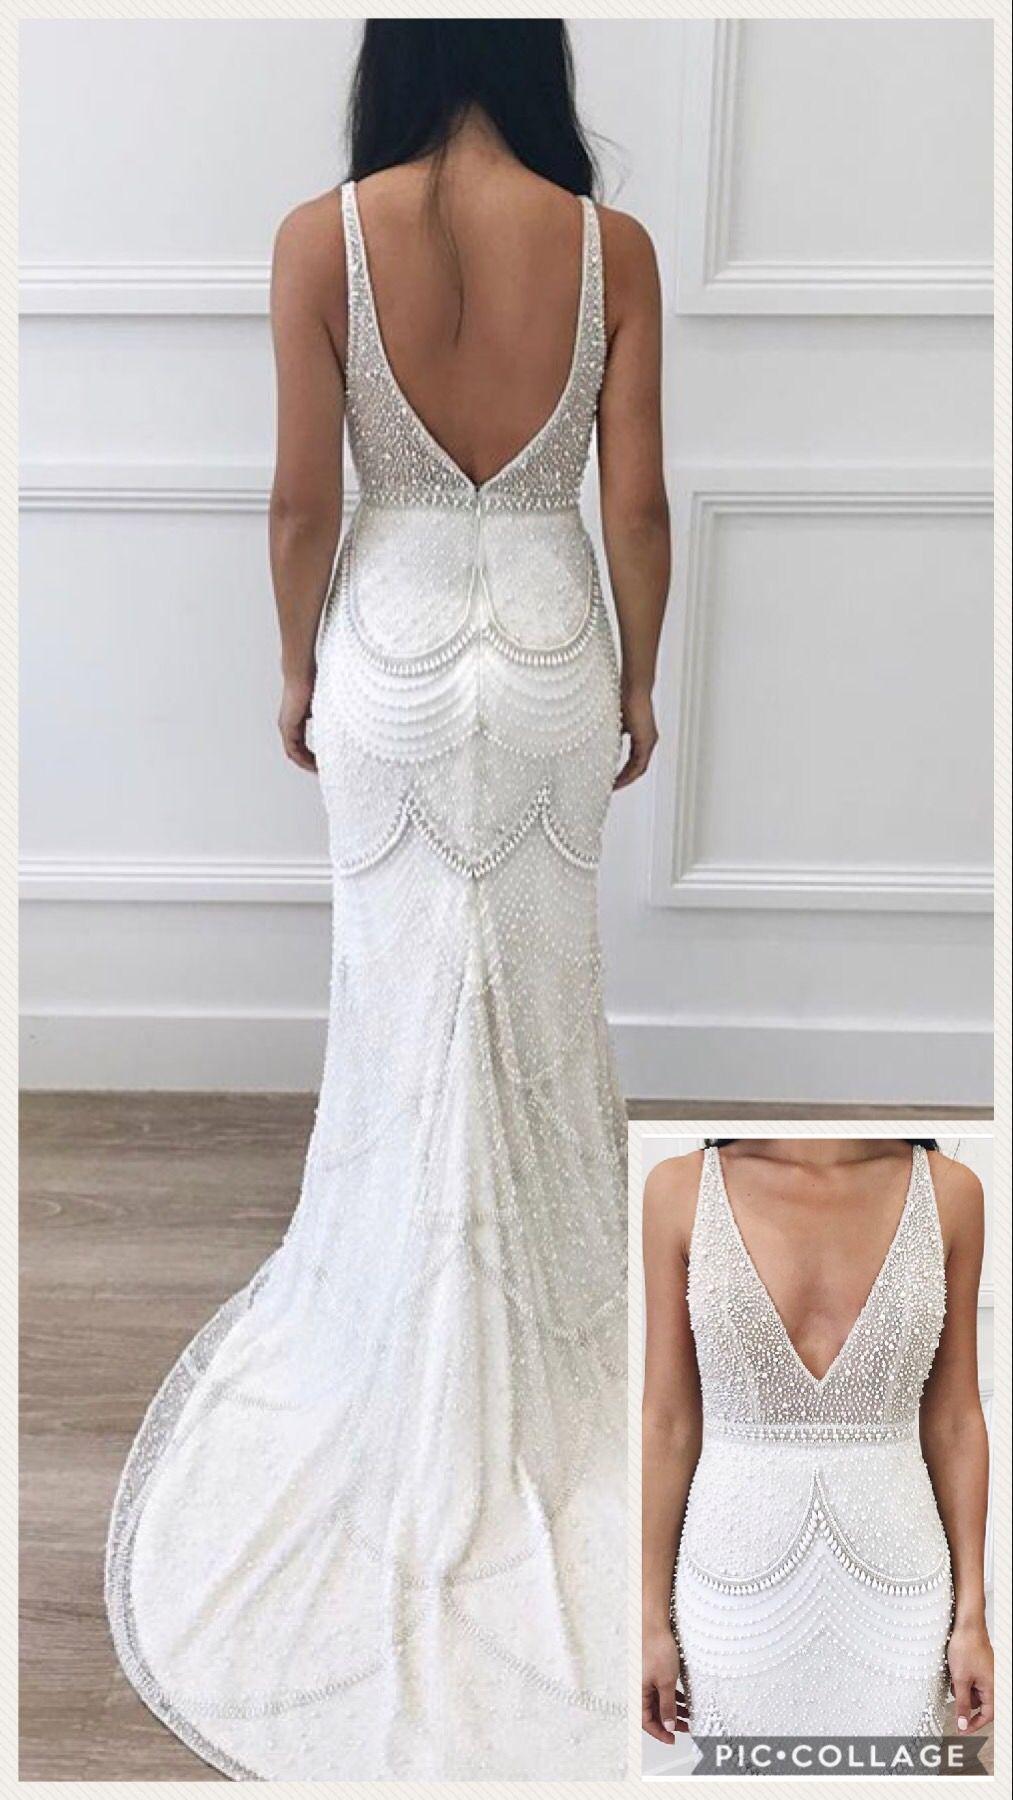 Wedding dress wedding pinterest wedding dresses wedding and